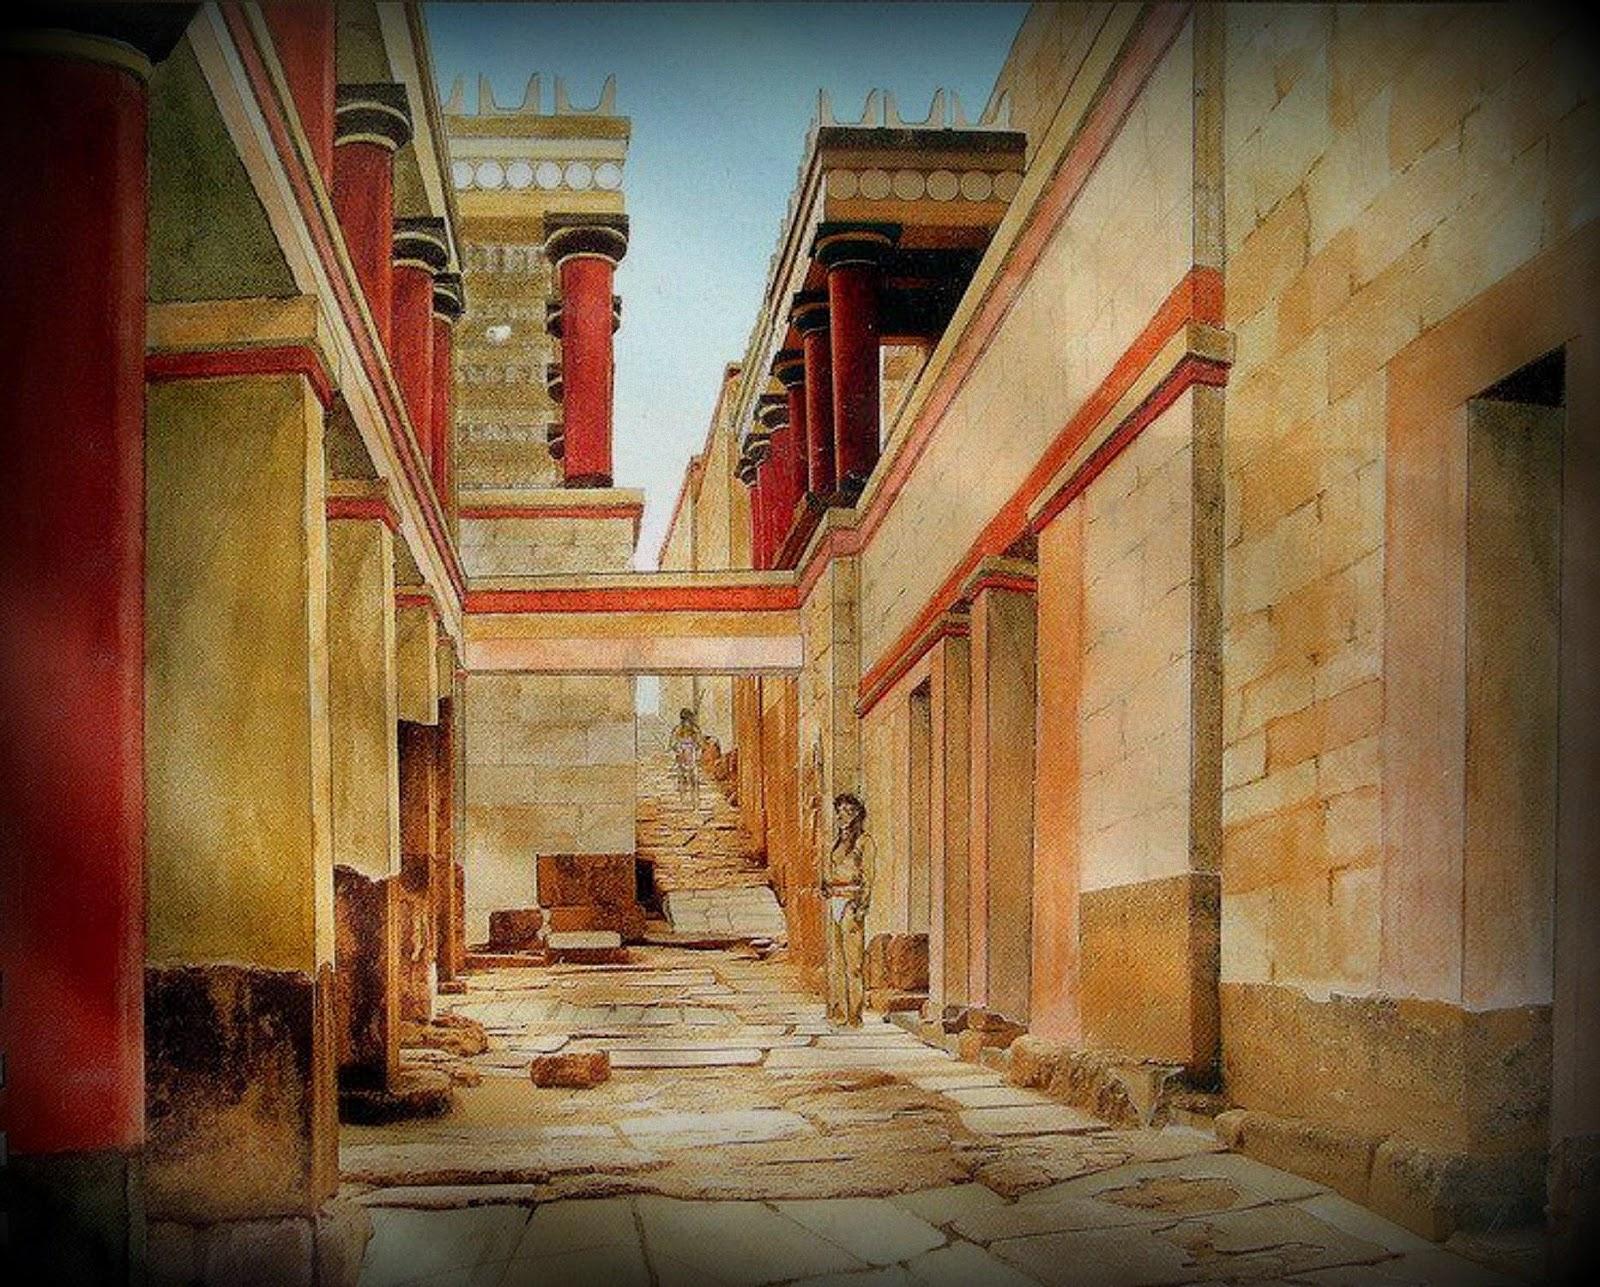 f919cd4d805 Οι οικισμοί της Βασιλικής, της Μύρτου και του Μόχλου είναι μερικά από τα  σημαντικά κέντρα αυτής της εποχής. Ολοκληρωμένη εικόνα της πρωτομινωικής  κοινωνικής ...